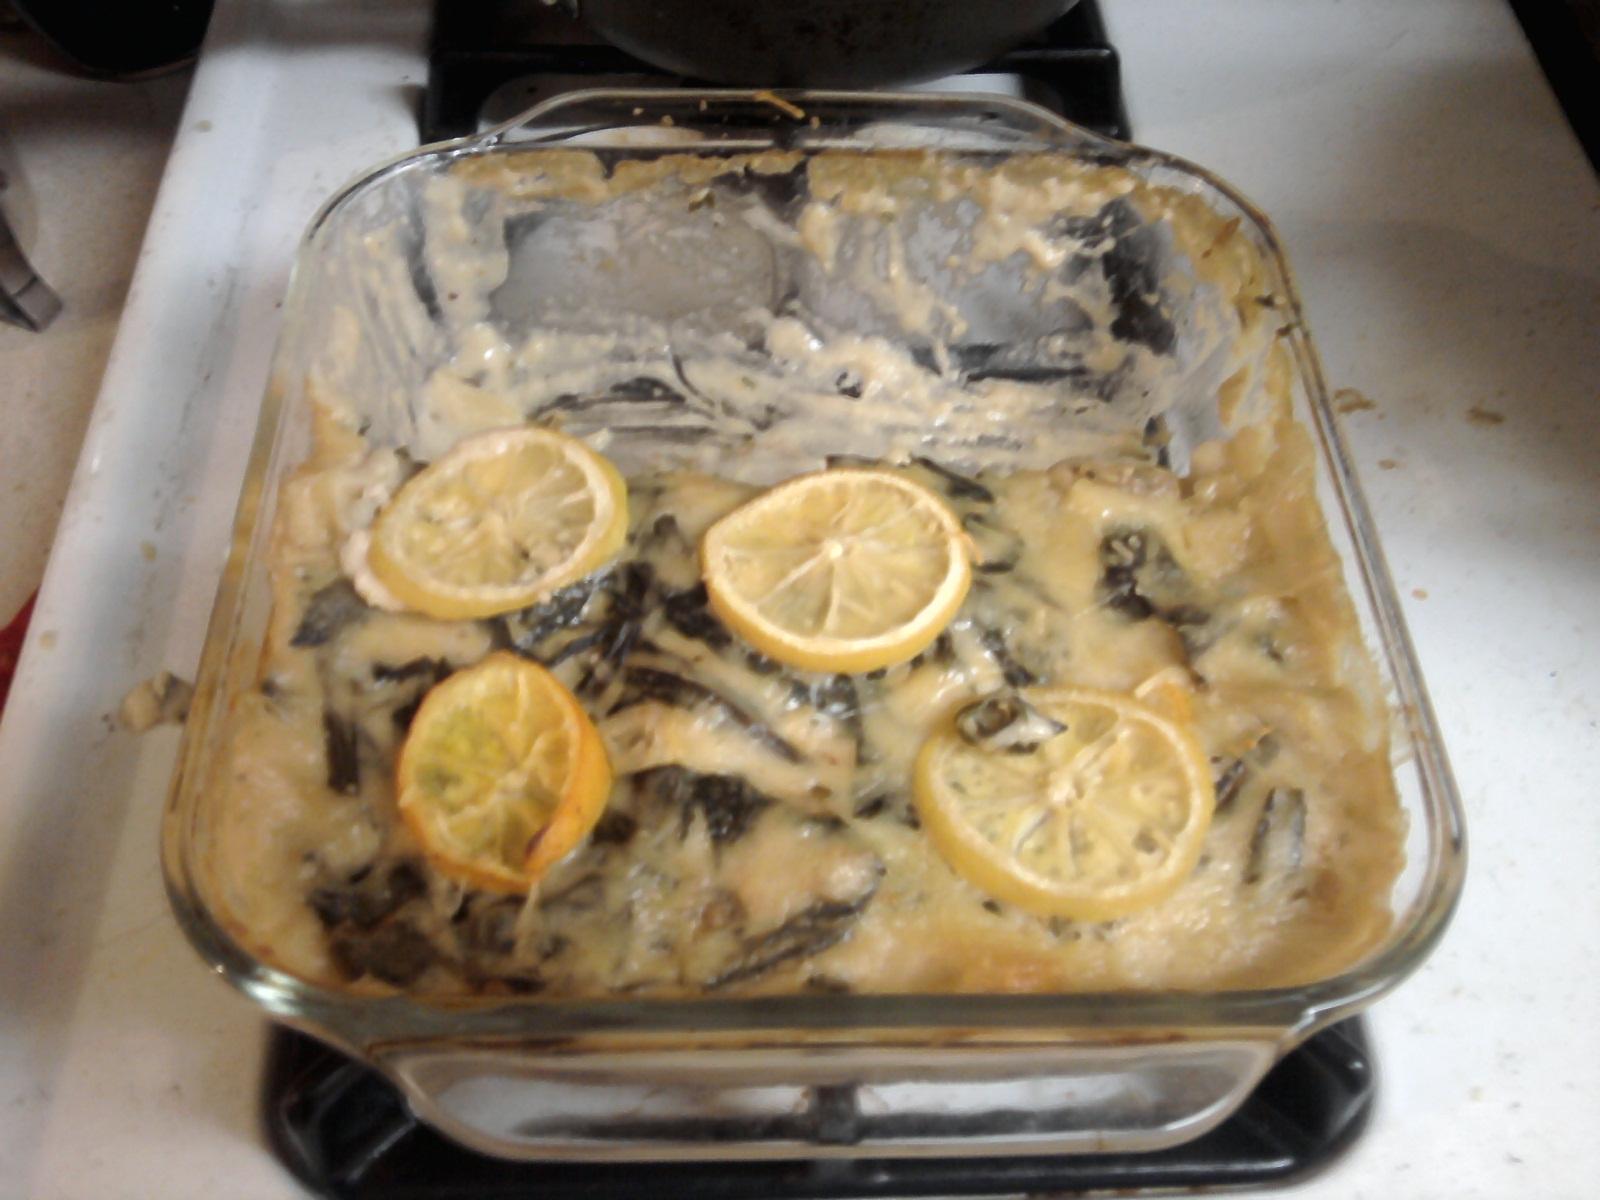 I love lemon five lemon recipes that I have made   knitbyahenshop